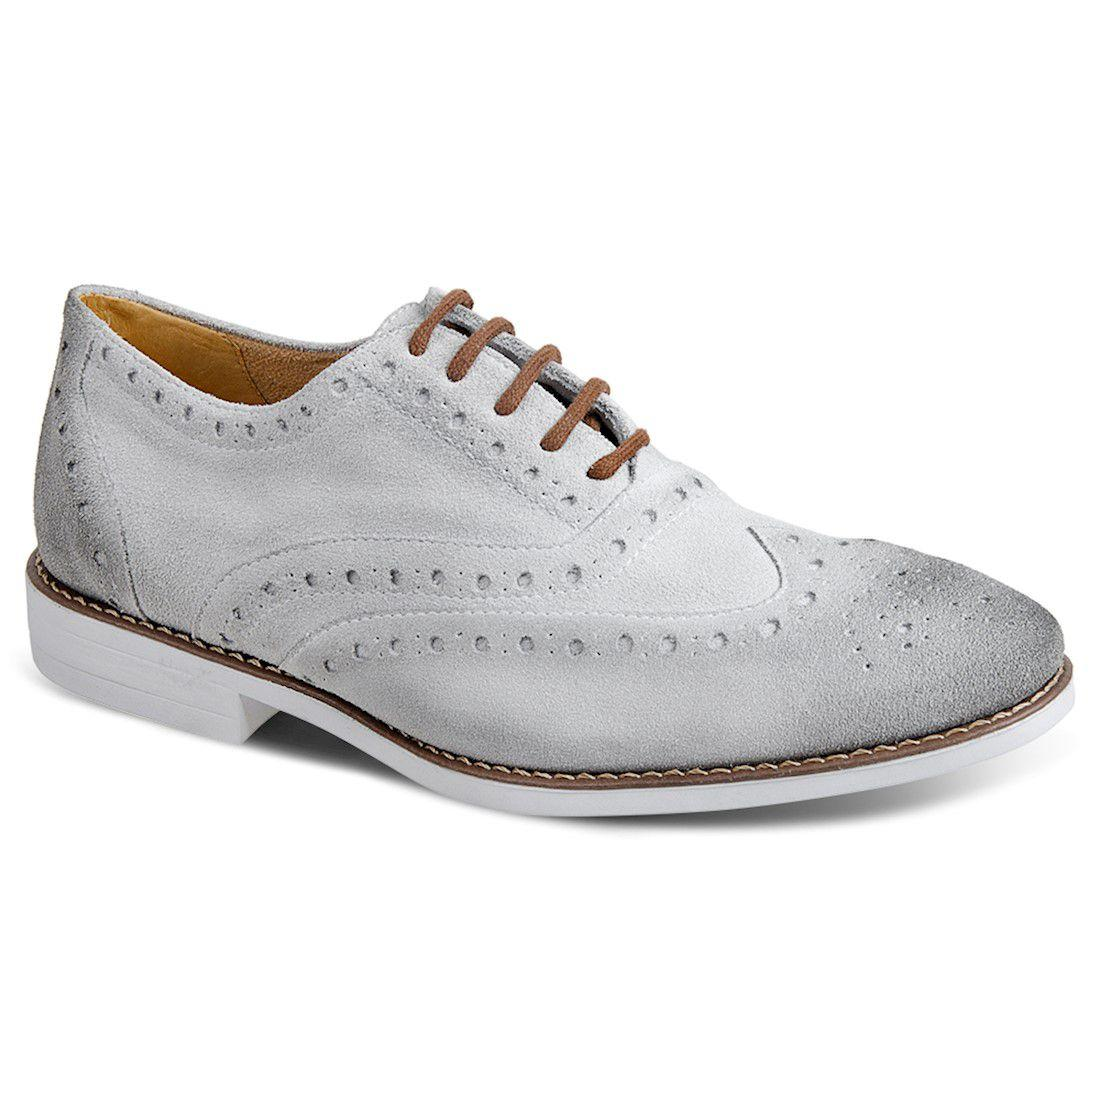 a6605a652 Sapato masculino casual brogue sandro moscoloni pompéia cinza grey R$  289,90 à vista. Adicionar à sacola